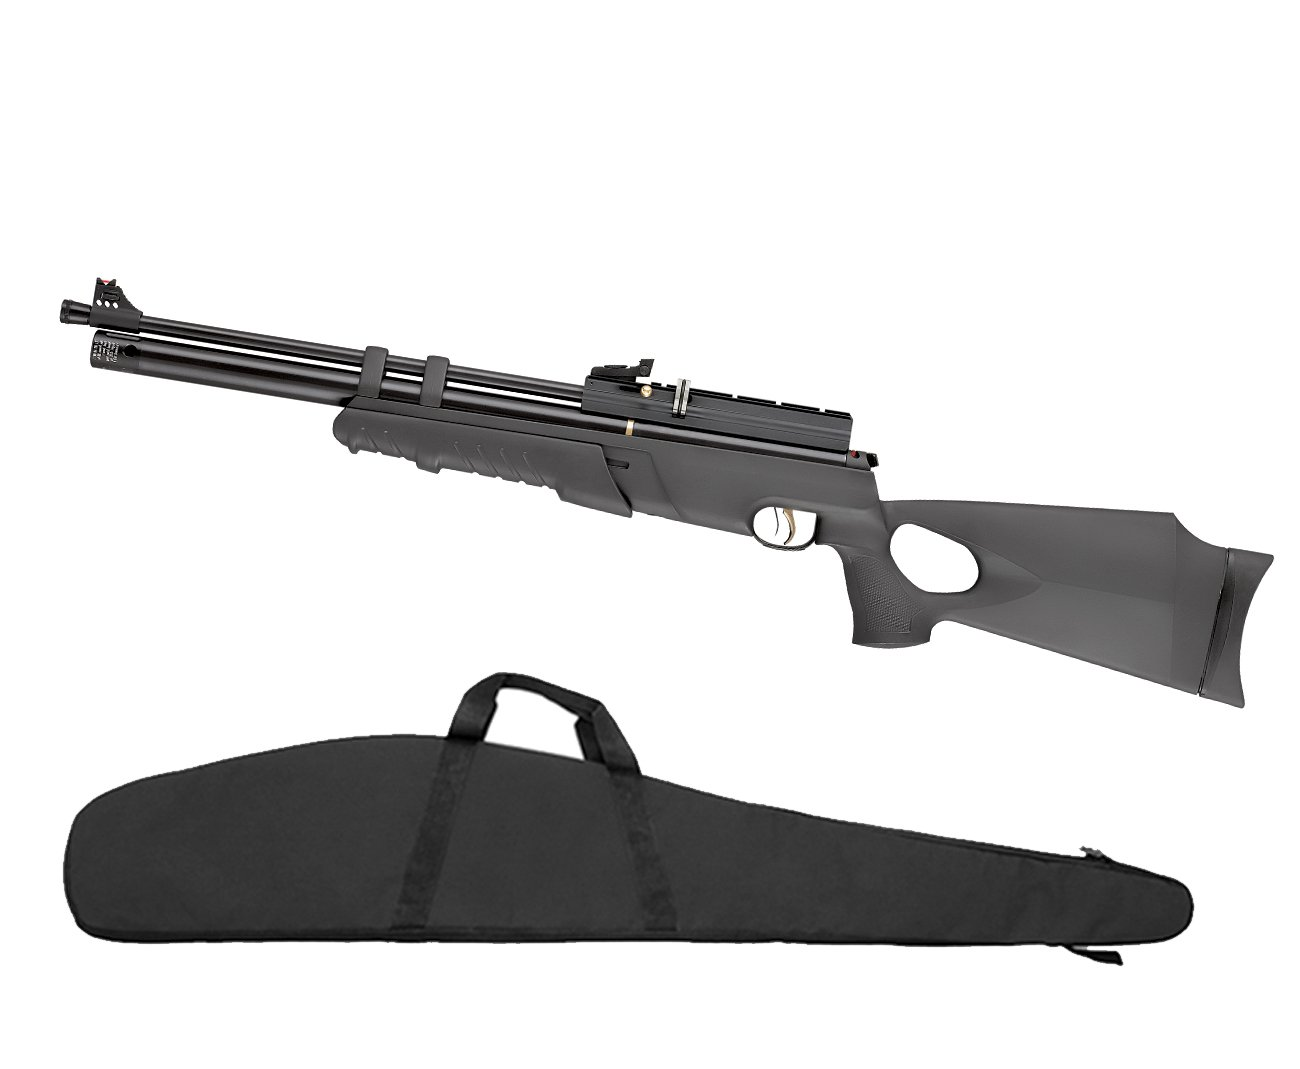 "Carabina De Pressão Hatsan Pcp At44-10pa - Cal. 5,5mm (pump Action) + Capa 46"""